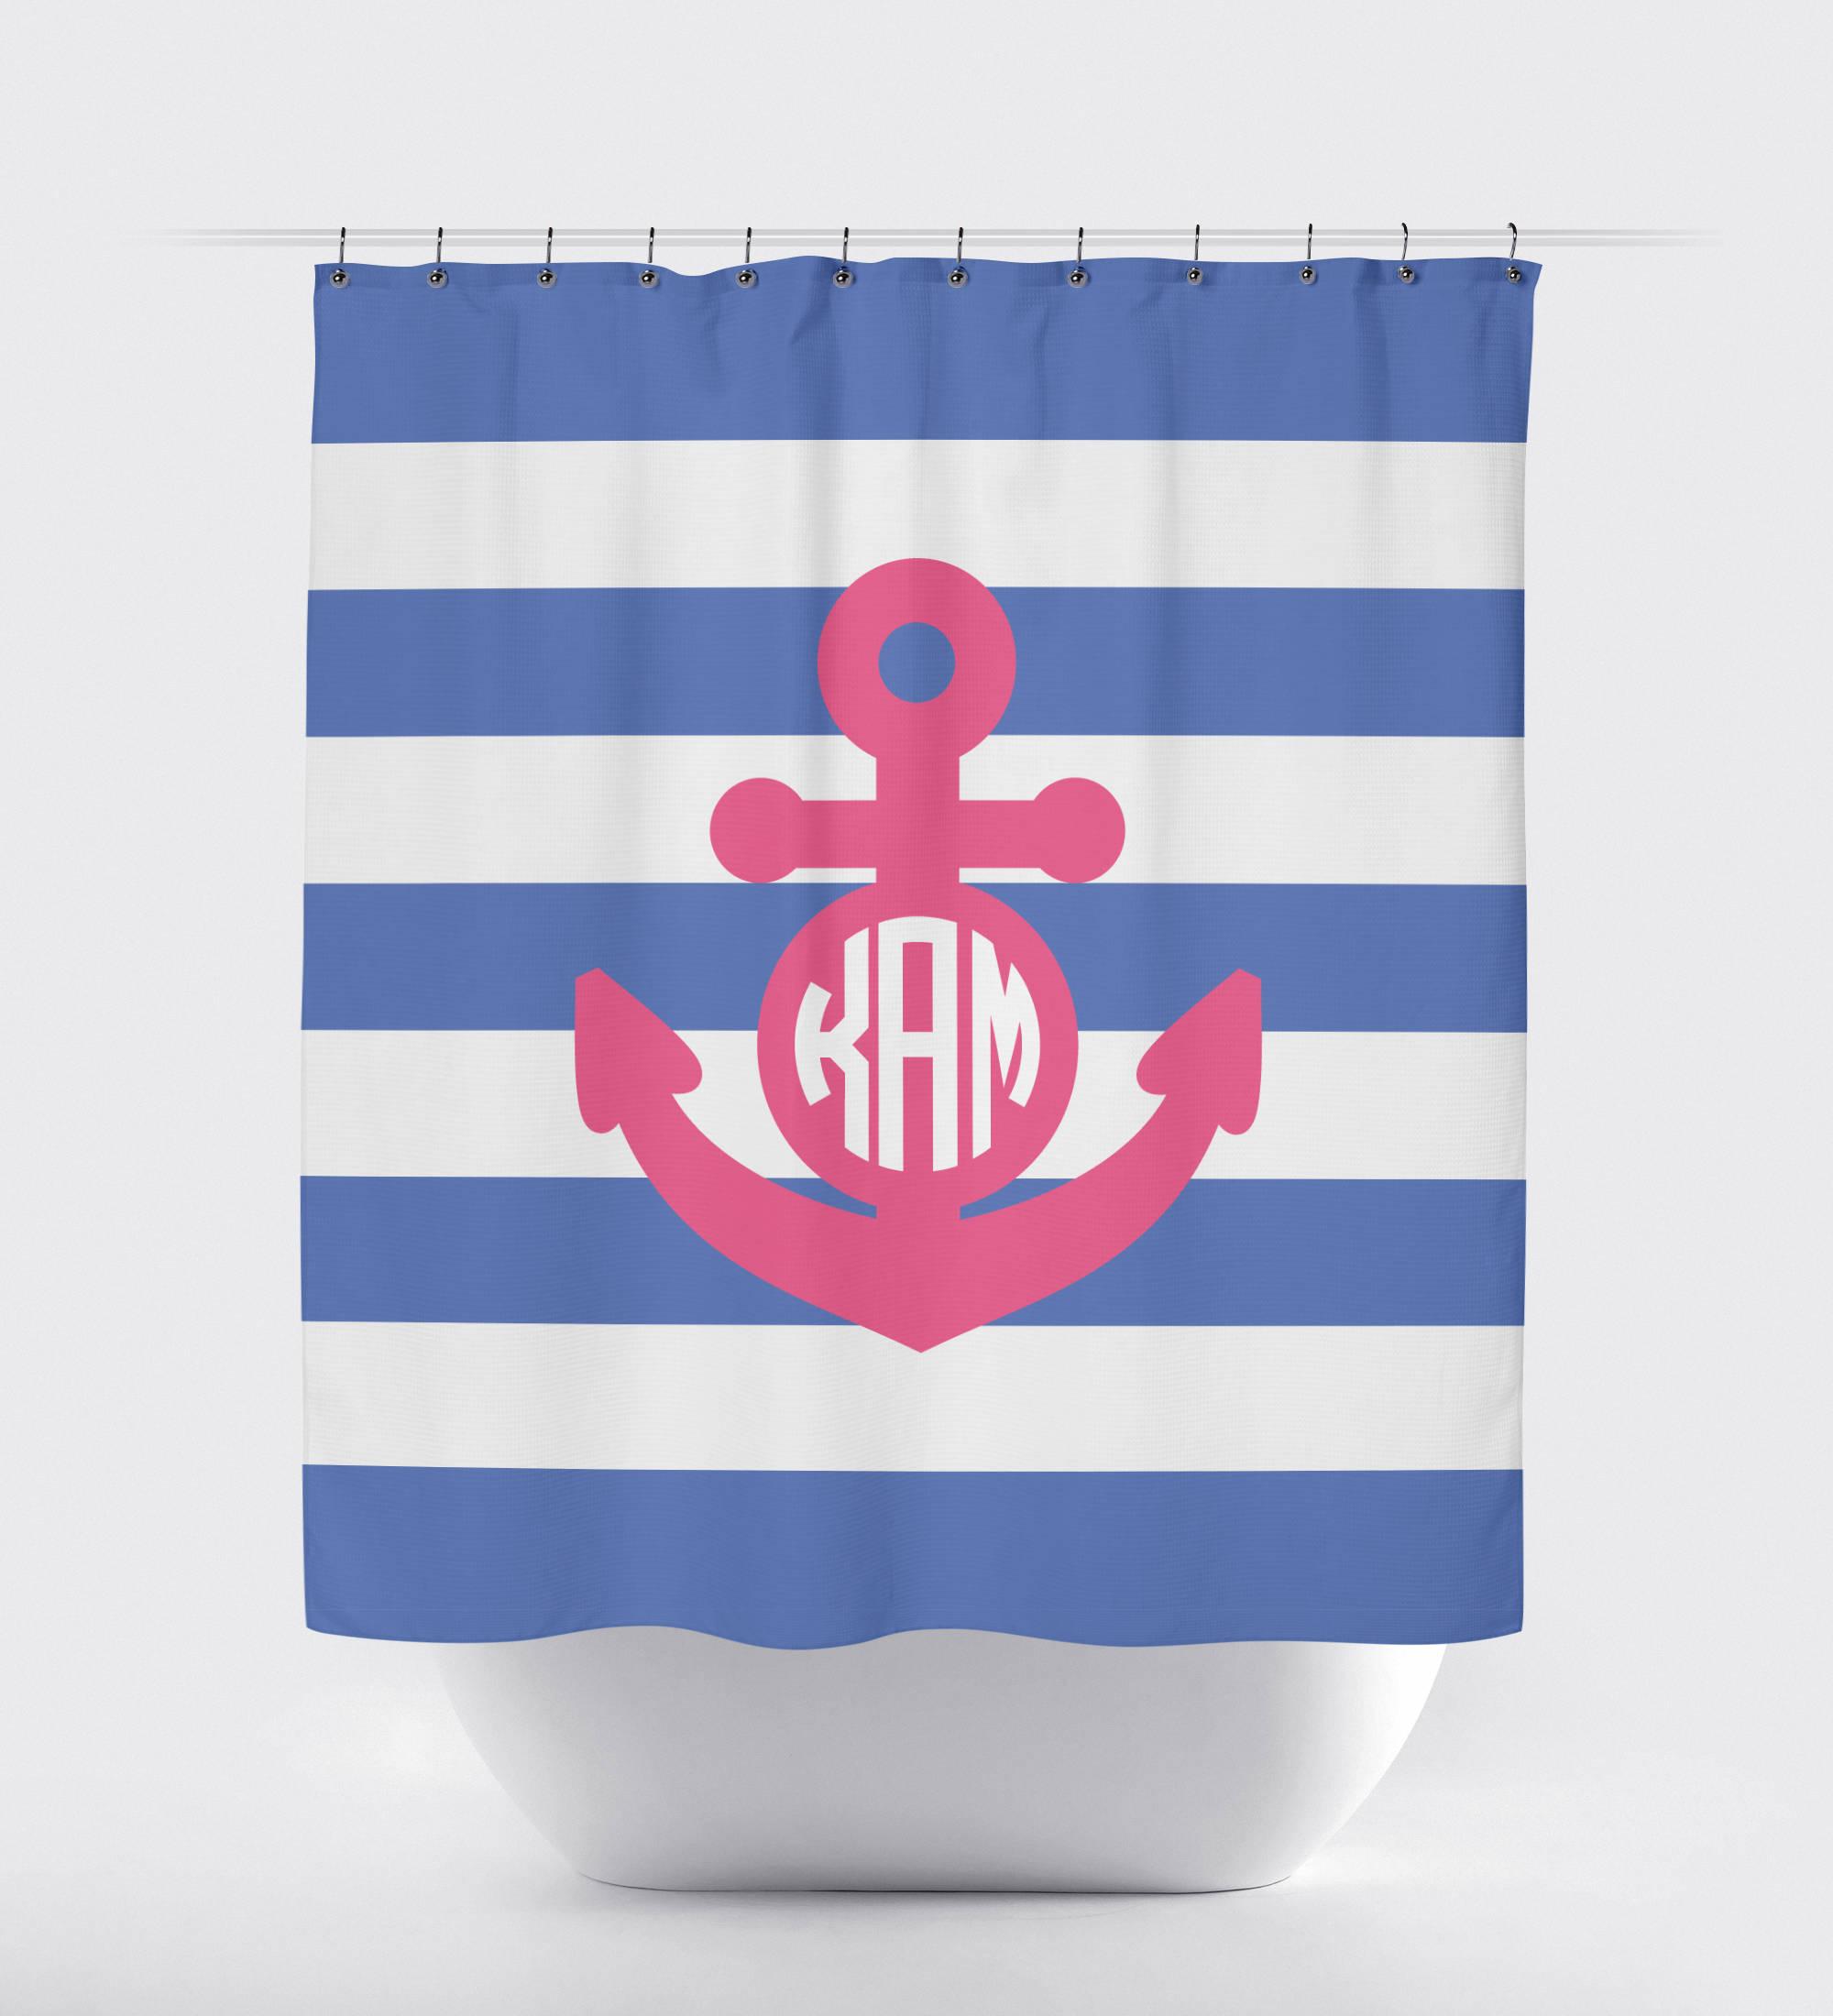 Nautical Shower Curtain | Nautical Decor | Anchor Shower Curtain ...